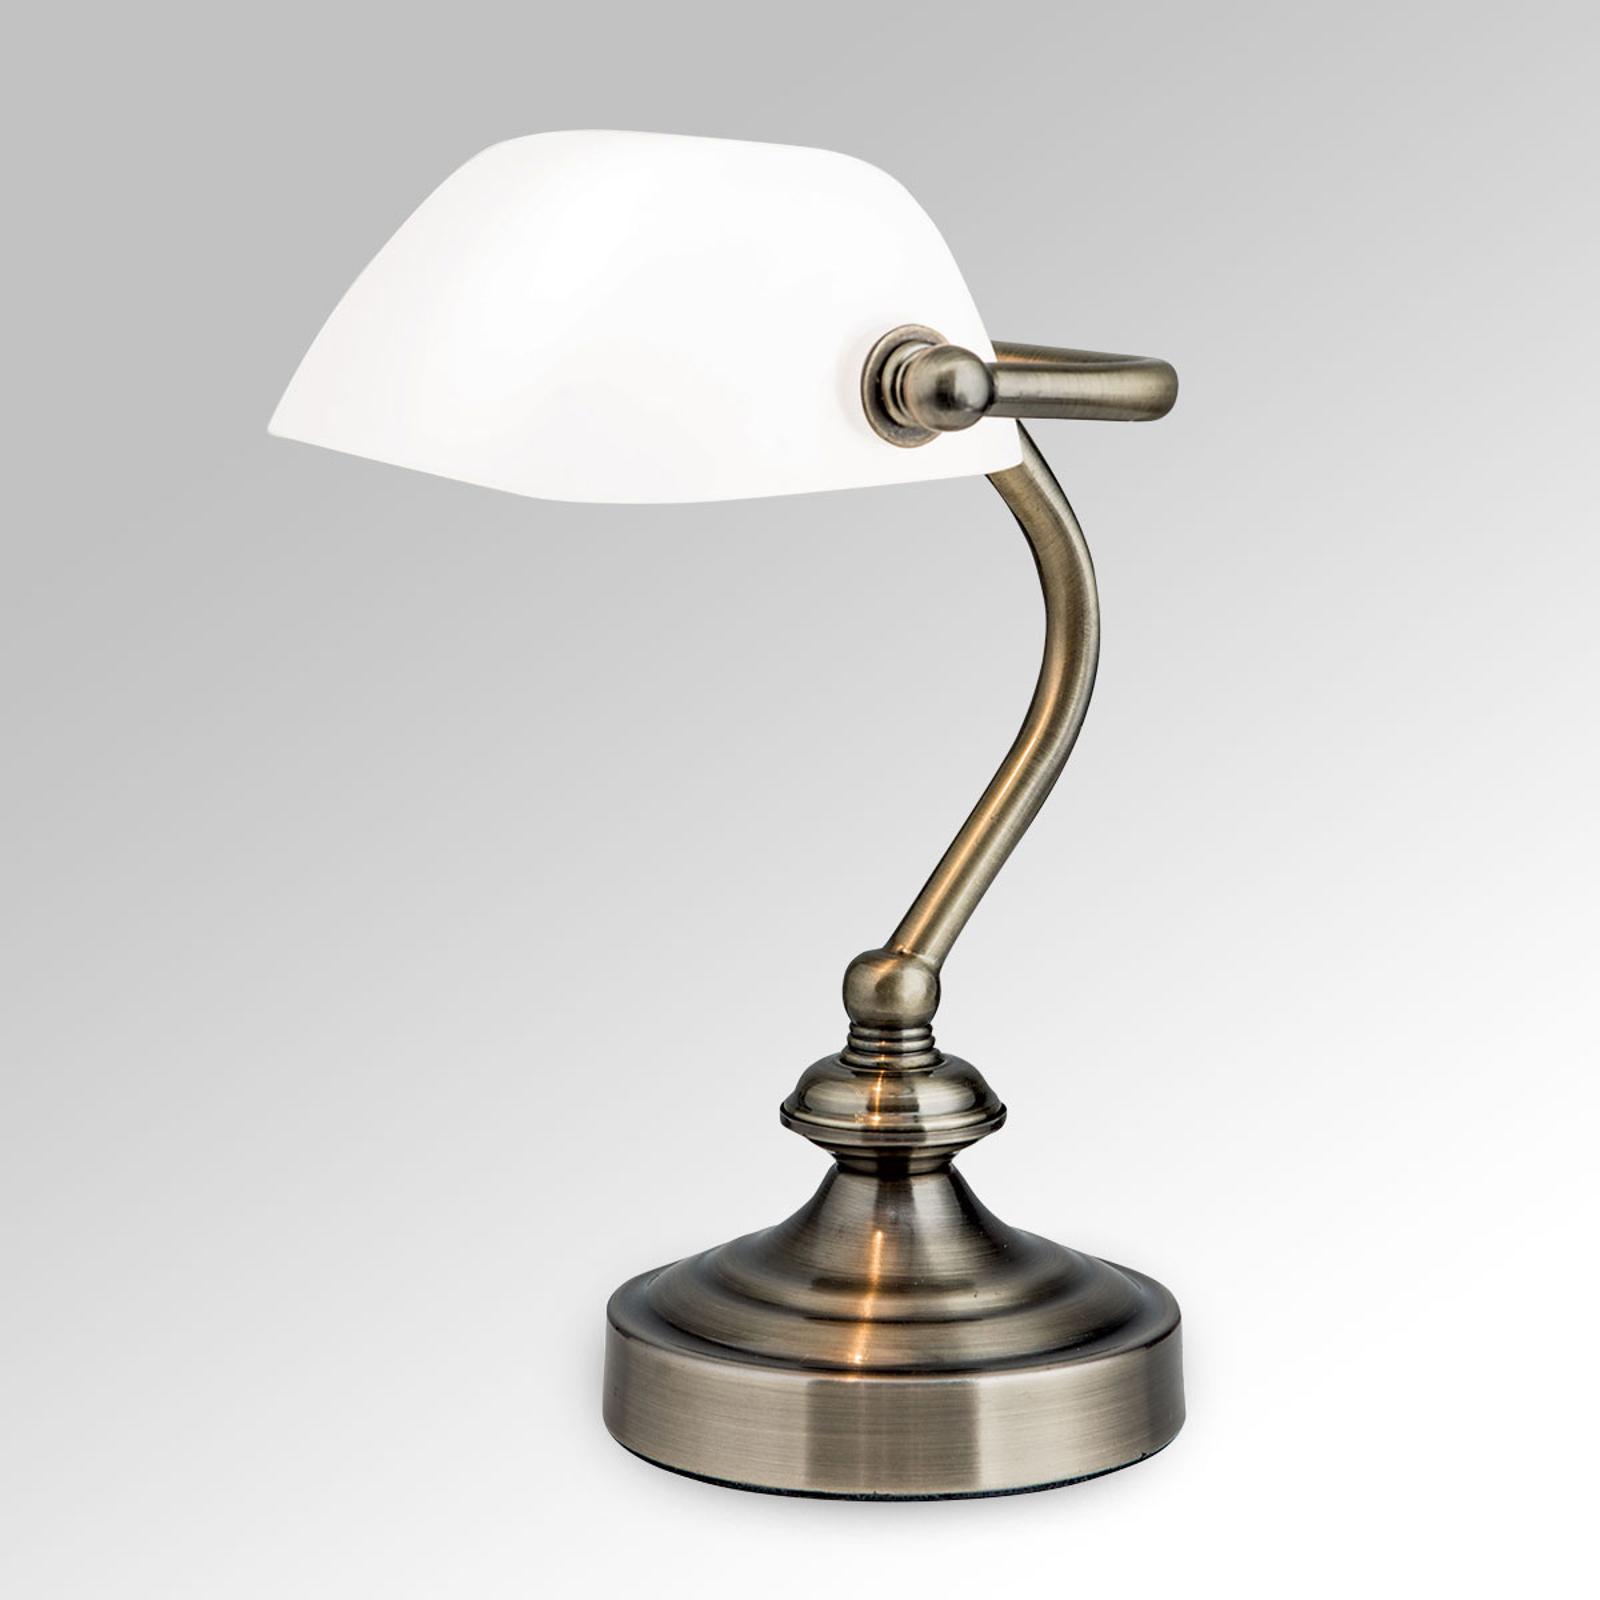 Klassisk bank bordlampe Zora med glasskærm